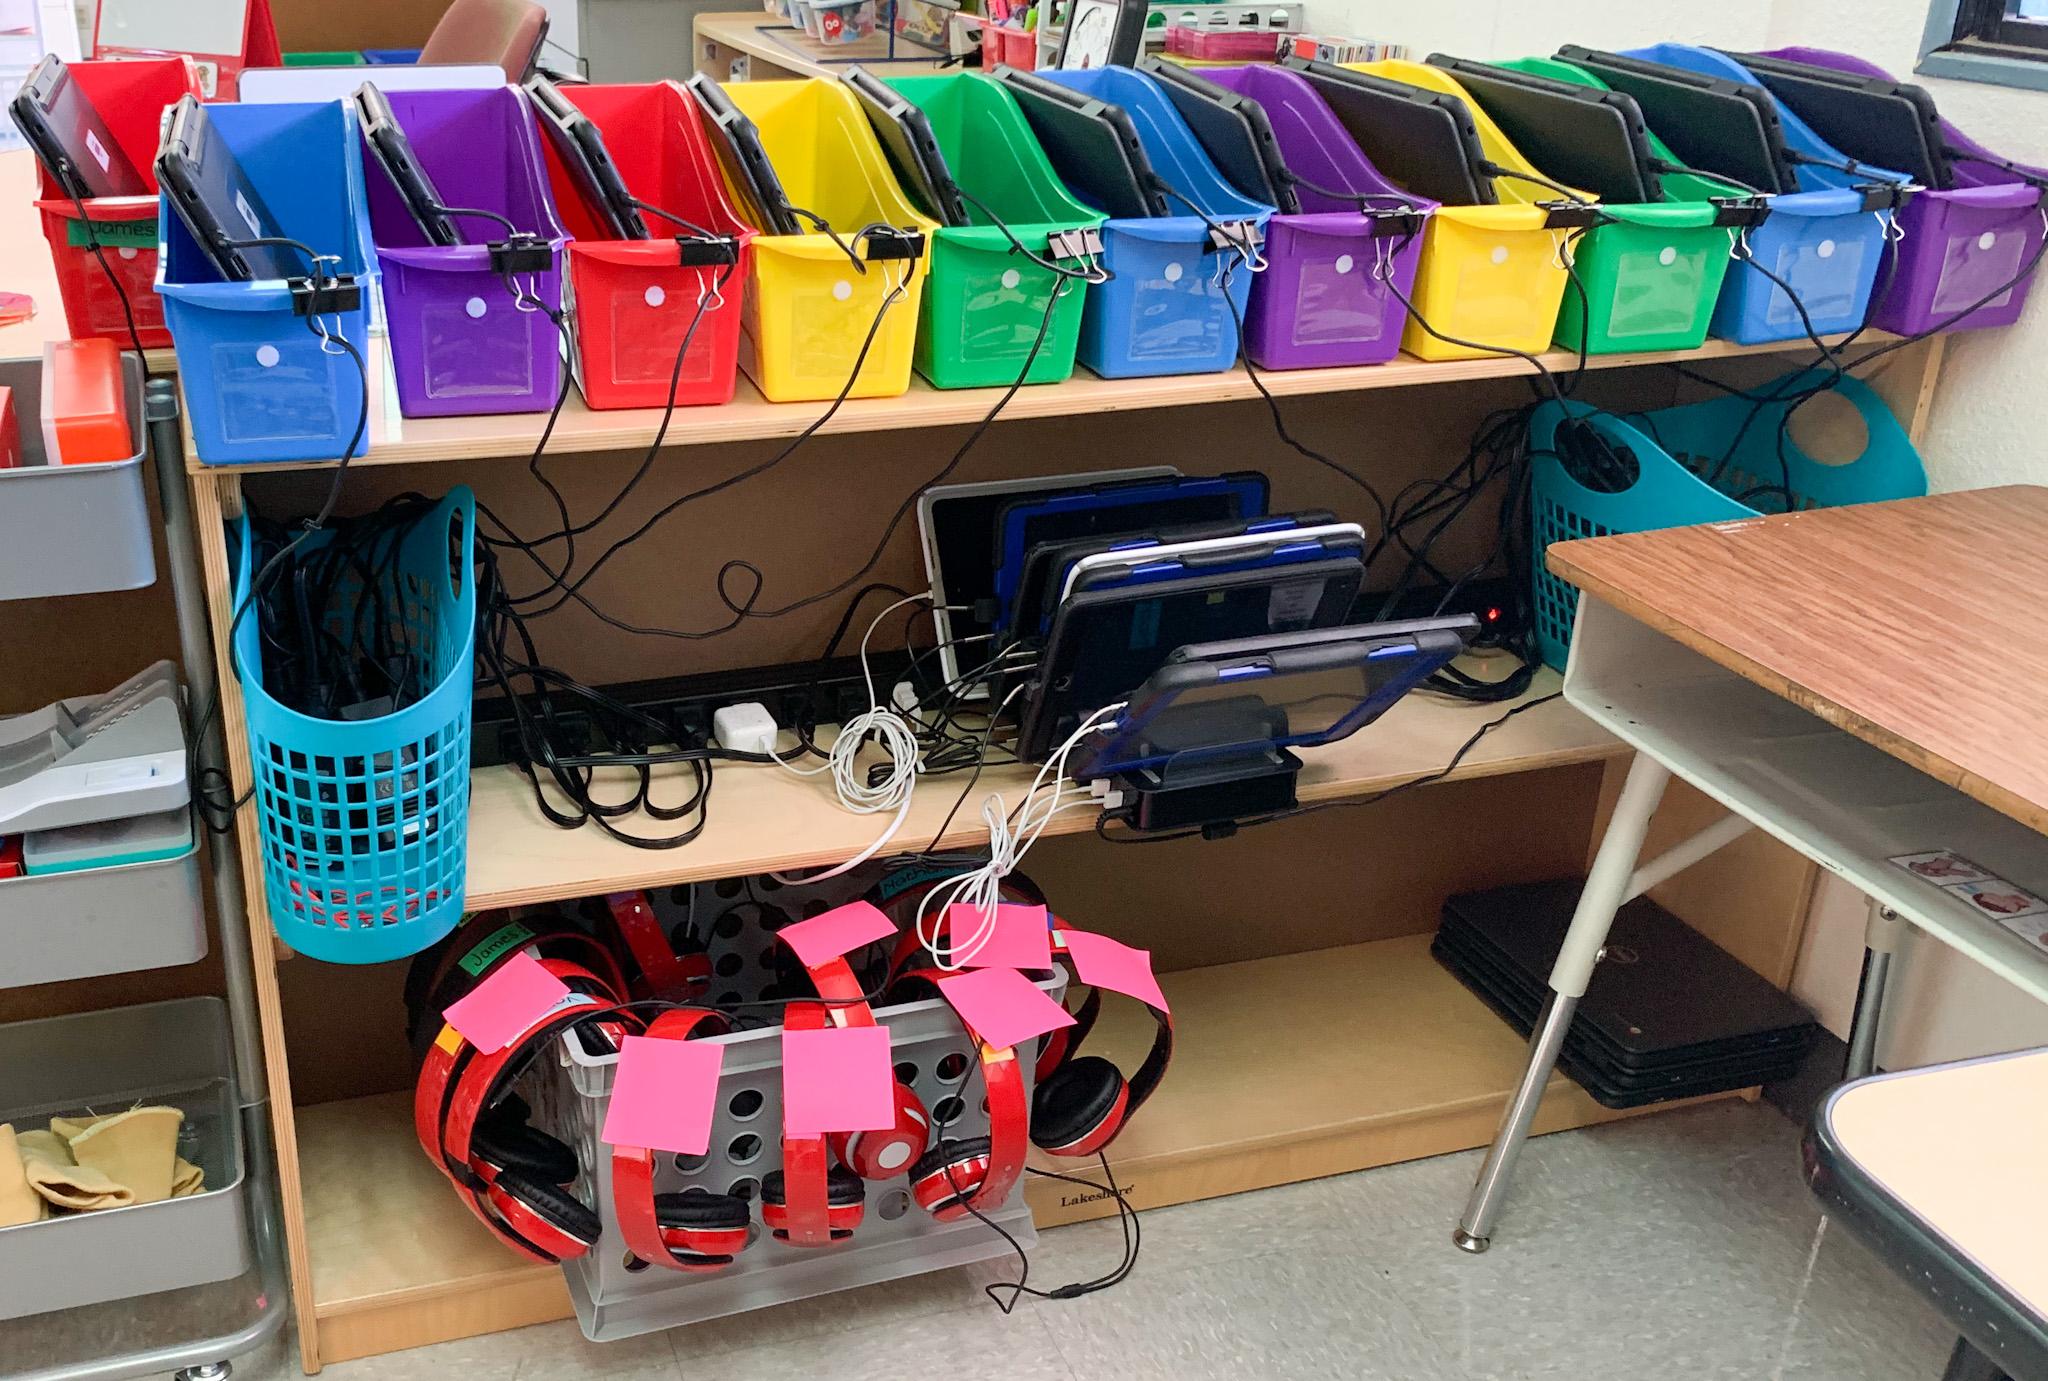 Here is how I organize my technology (iPads, Chromebook, headphones)